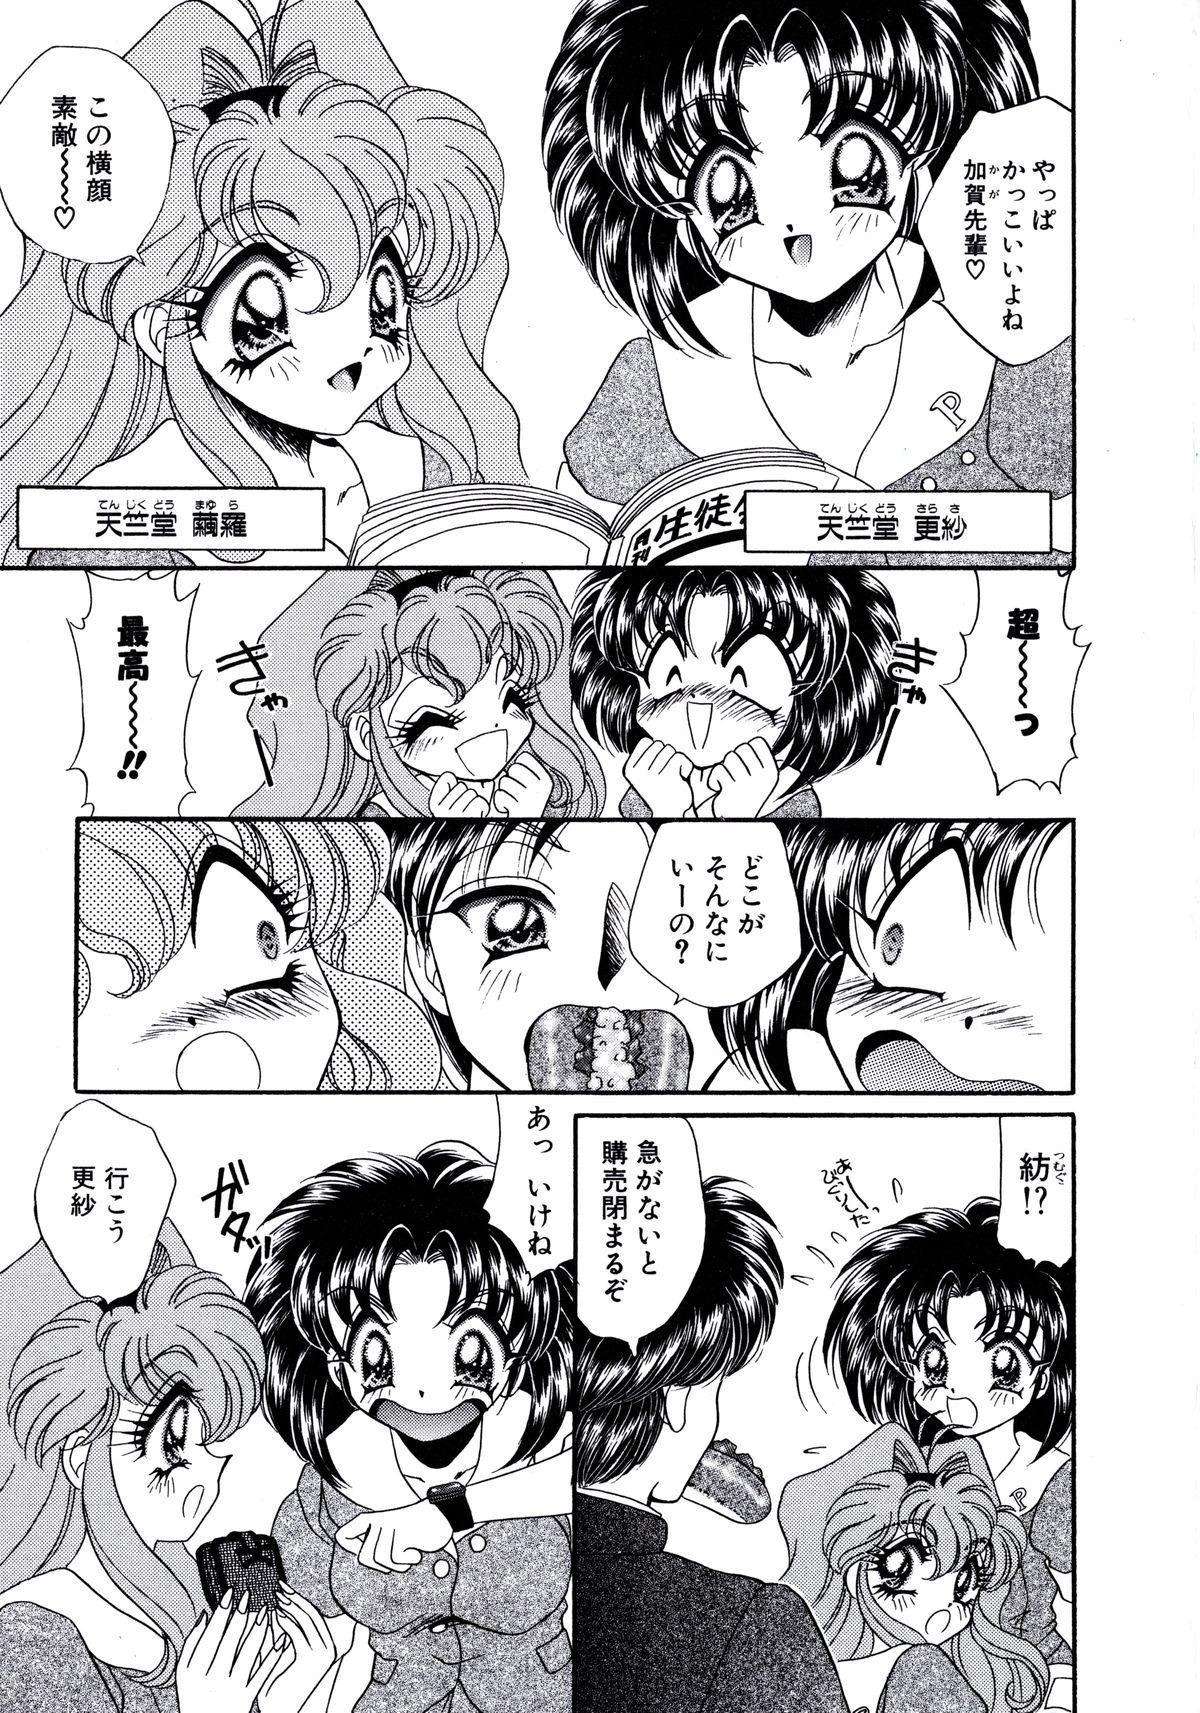 Kigurumi Sentai Quiltian 7